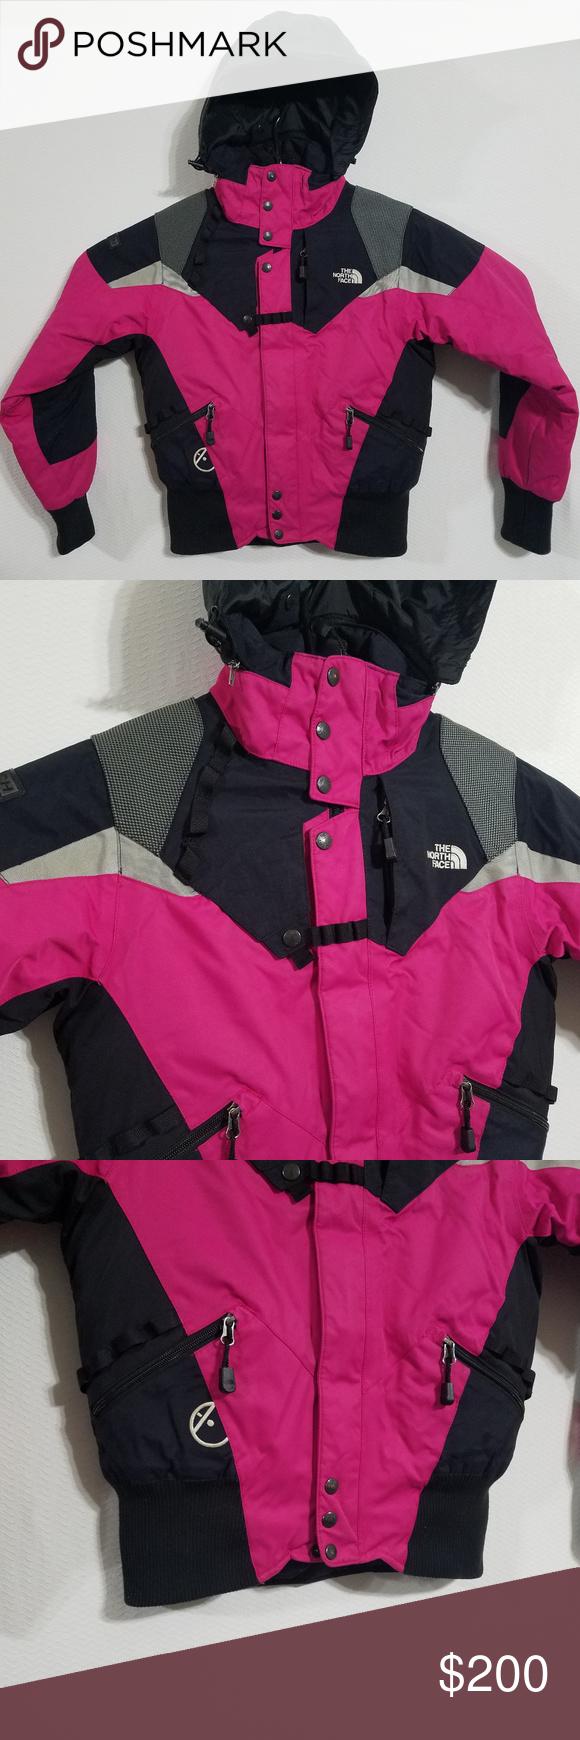 North Face Womens Small Pink Winter Jacket Coat North Face Jacket Womens North Face Coat North Face Women [ 1740 x 580 Pixel ]